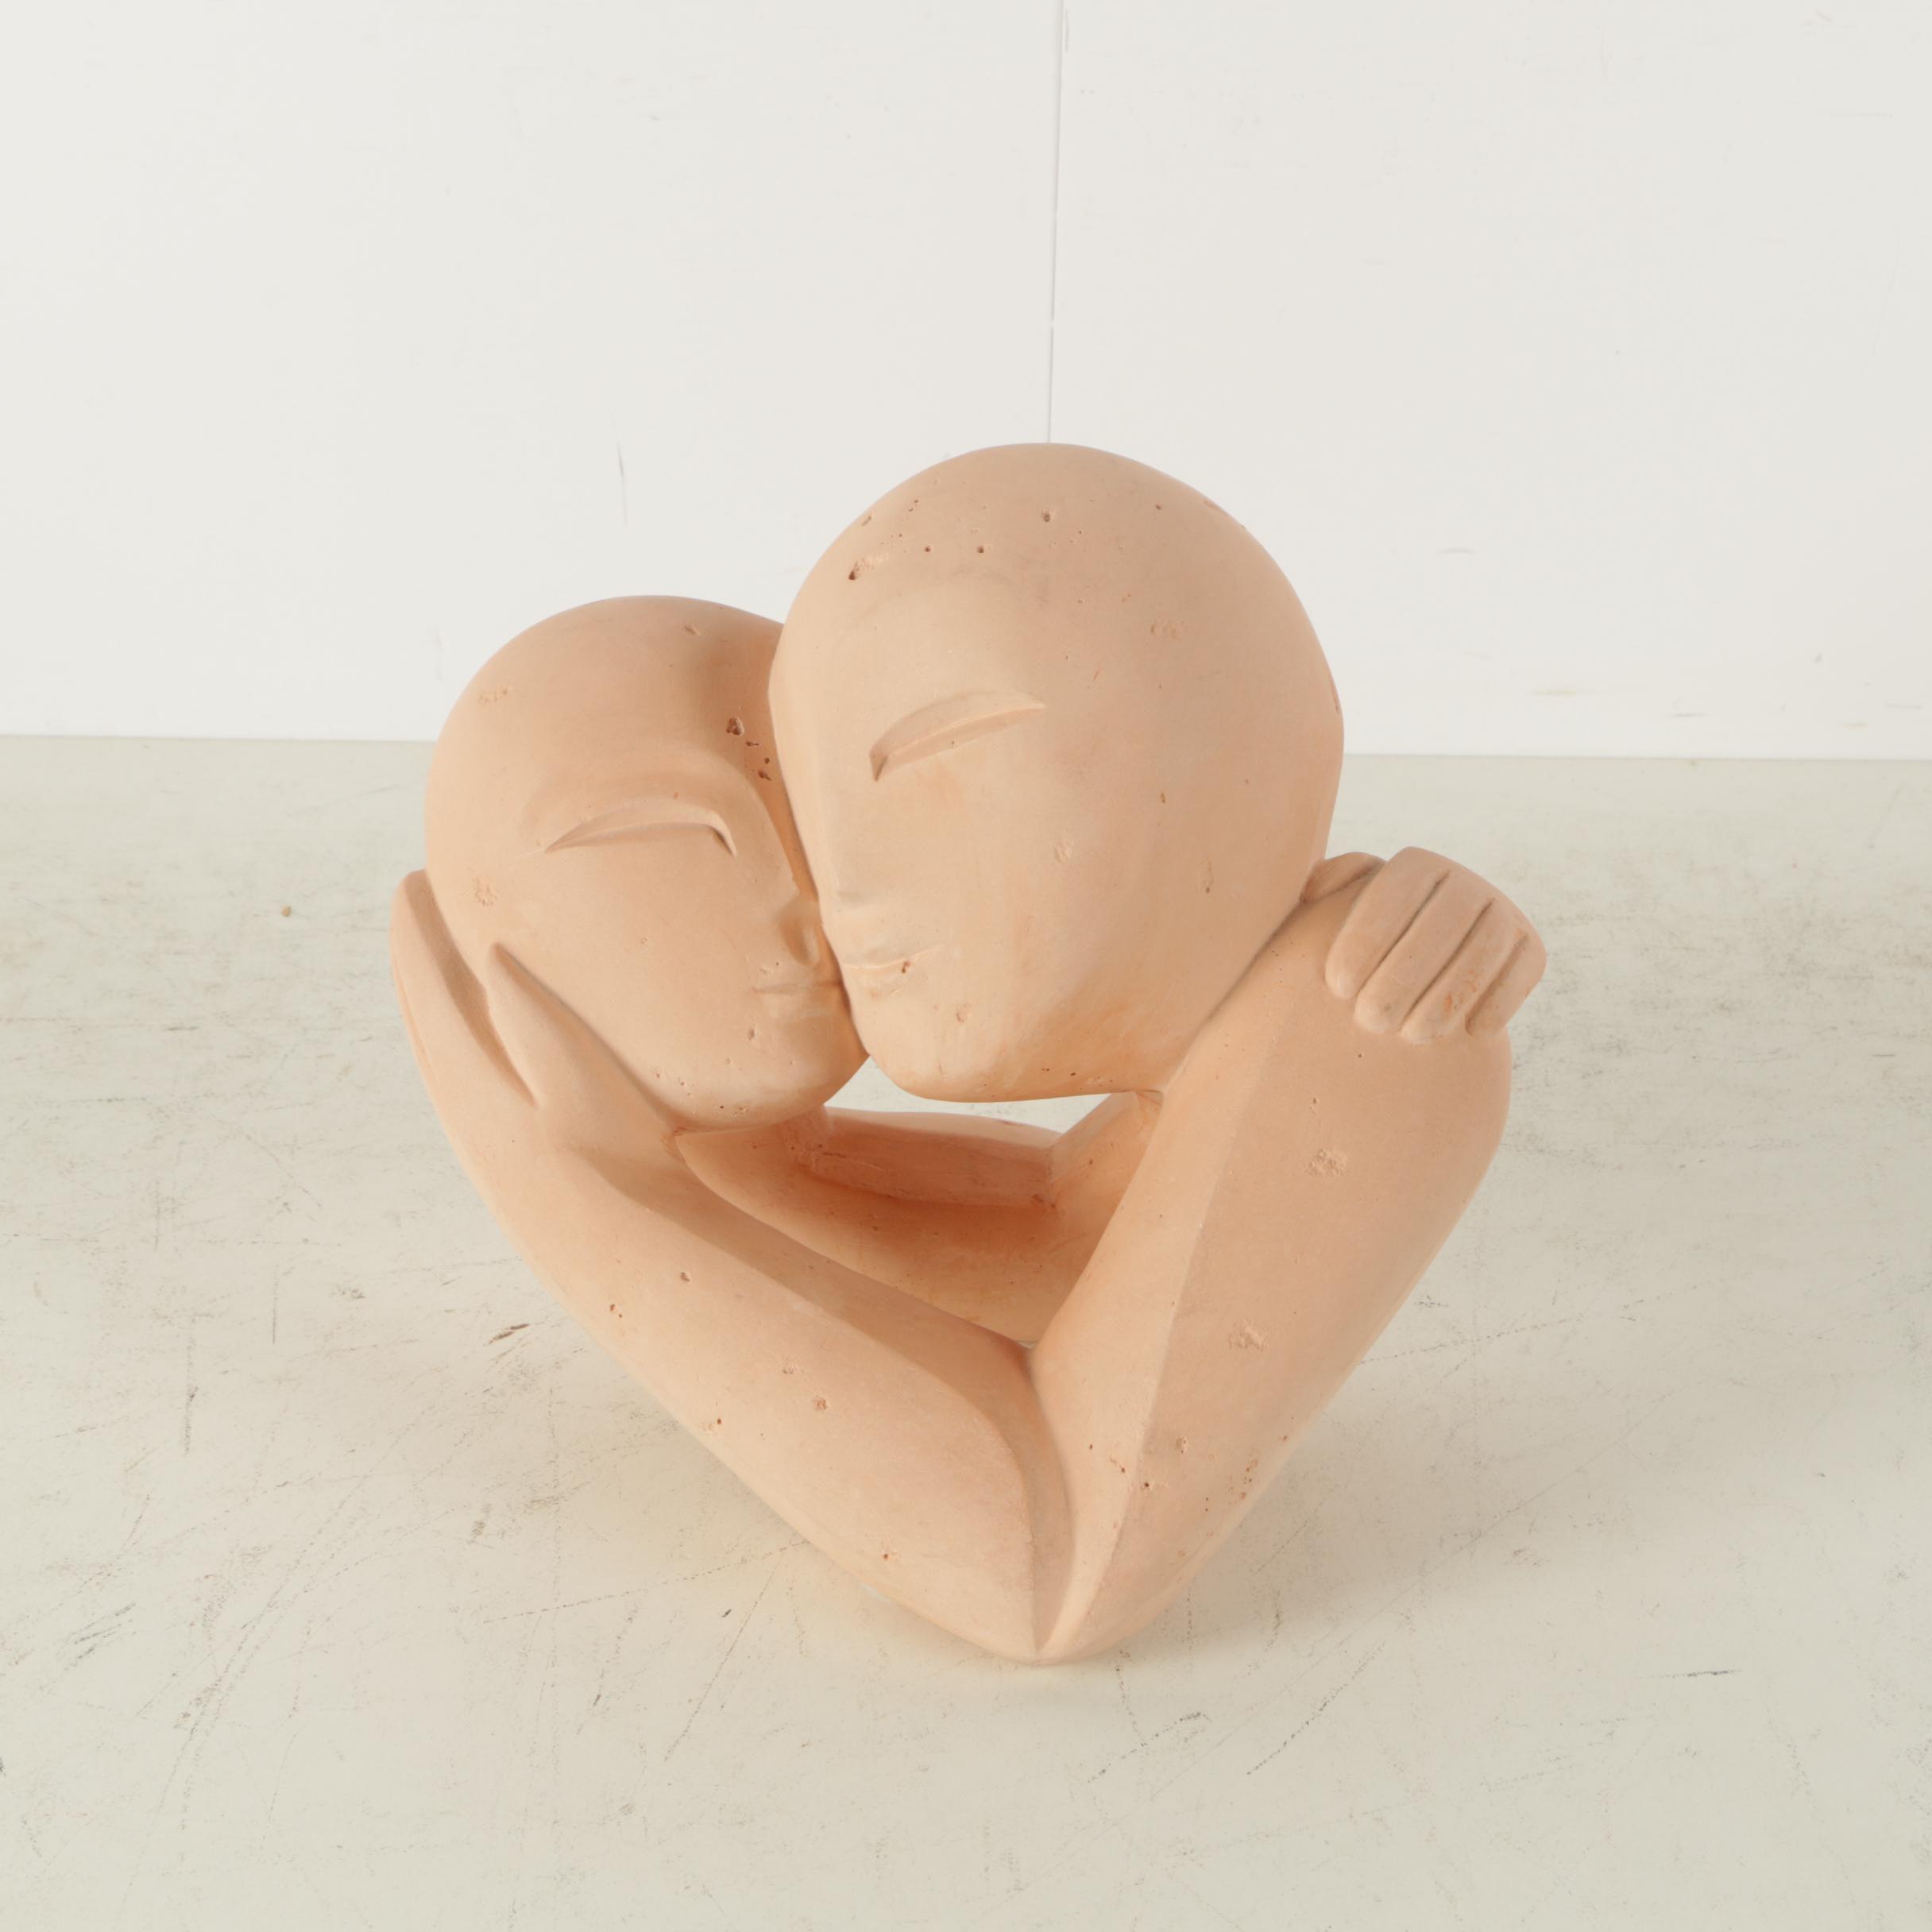 Karen Swilden Ceramic Sculpture of an Embracing Couple